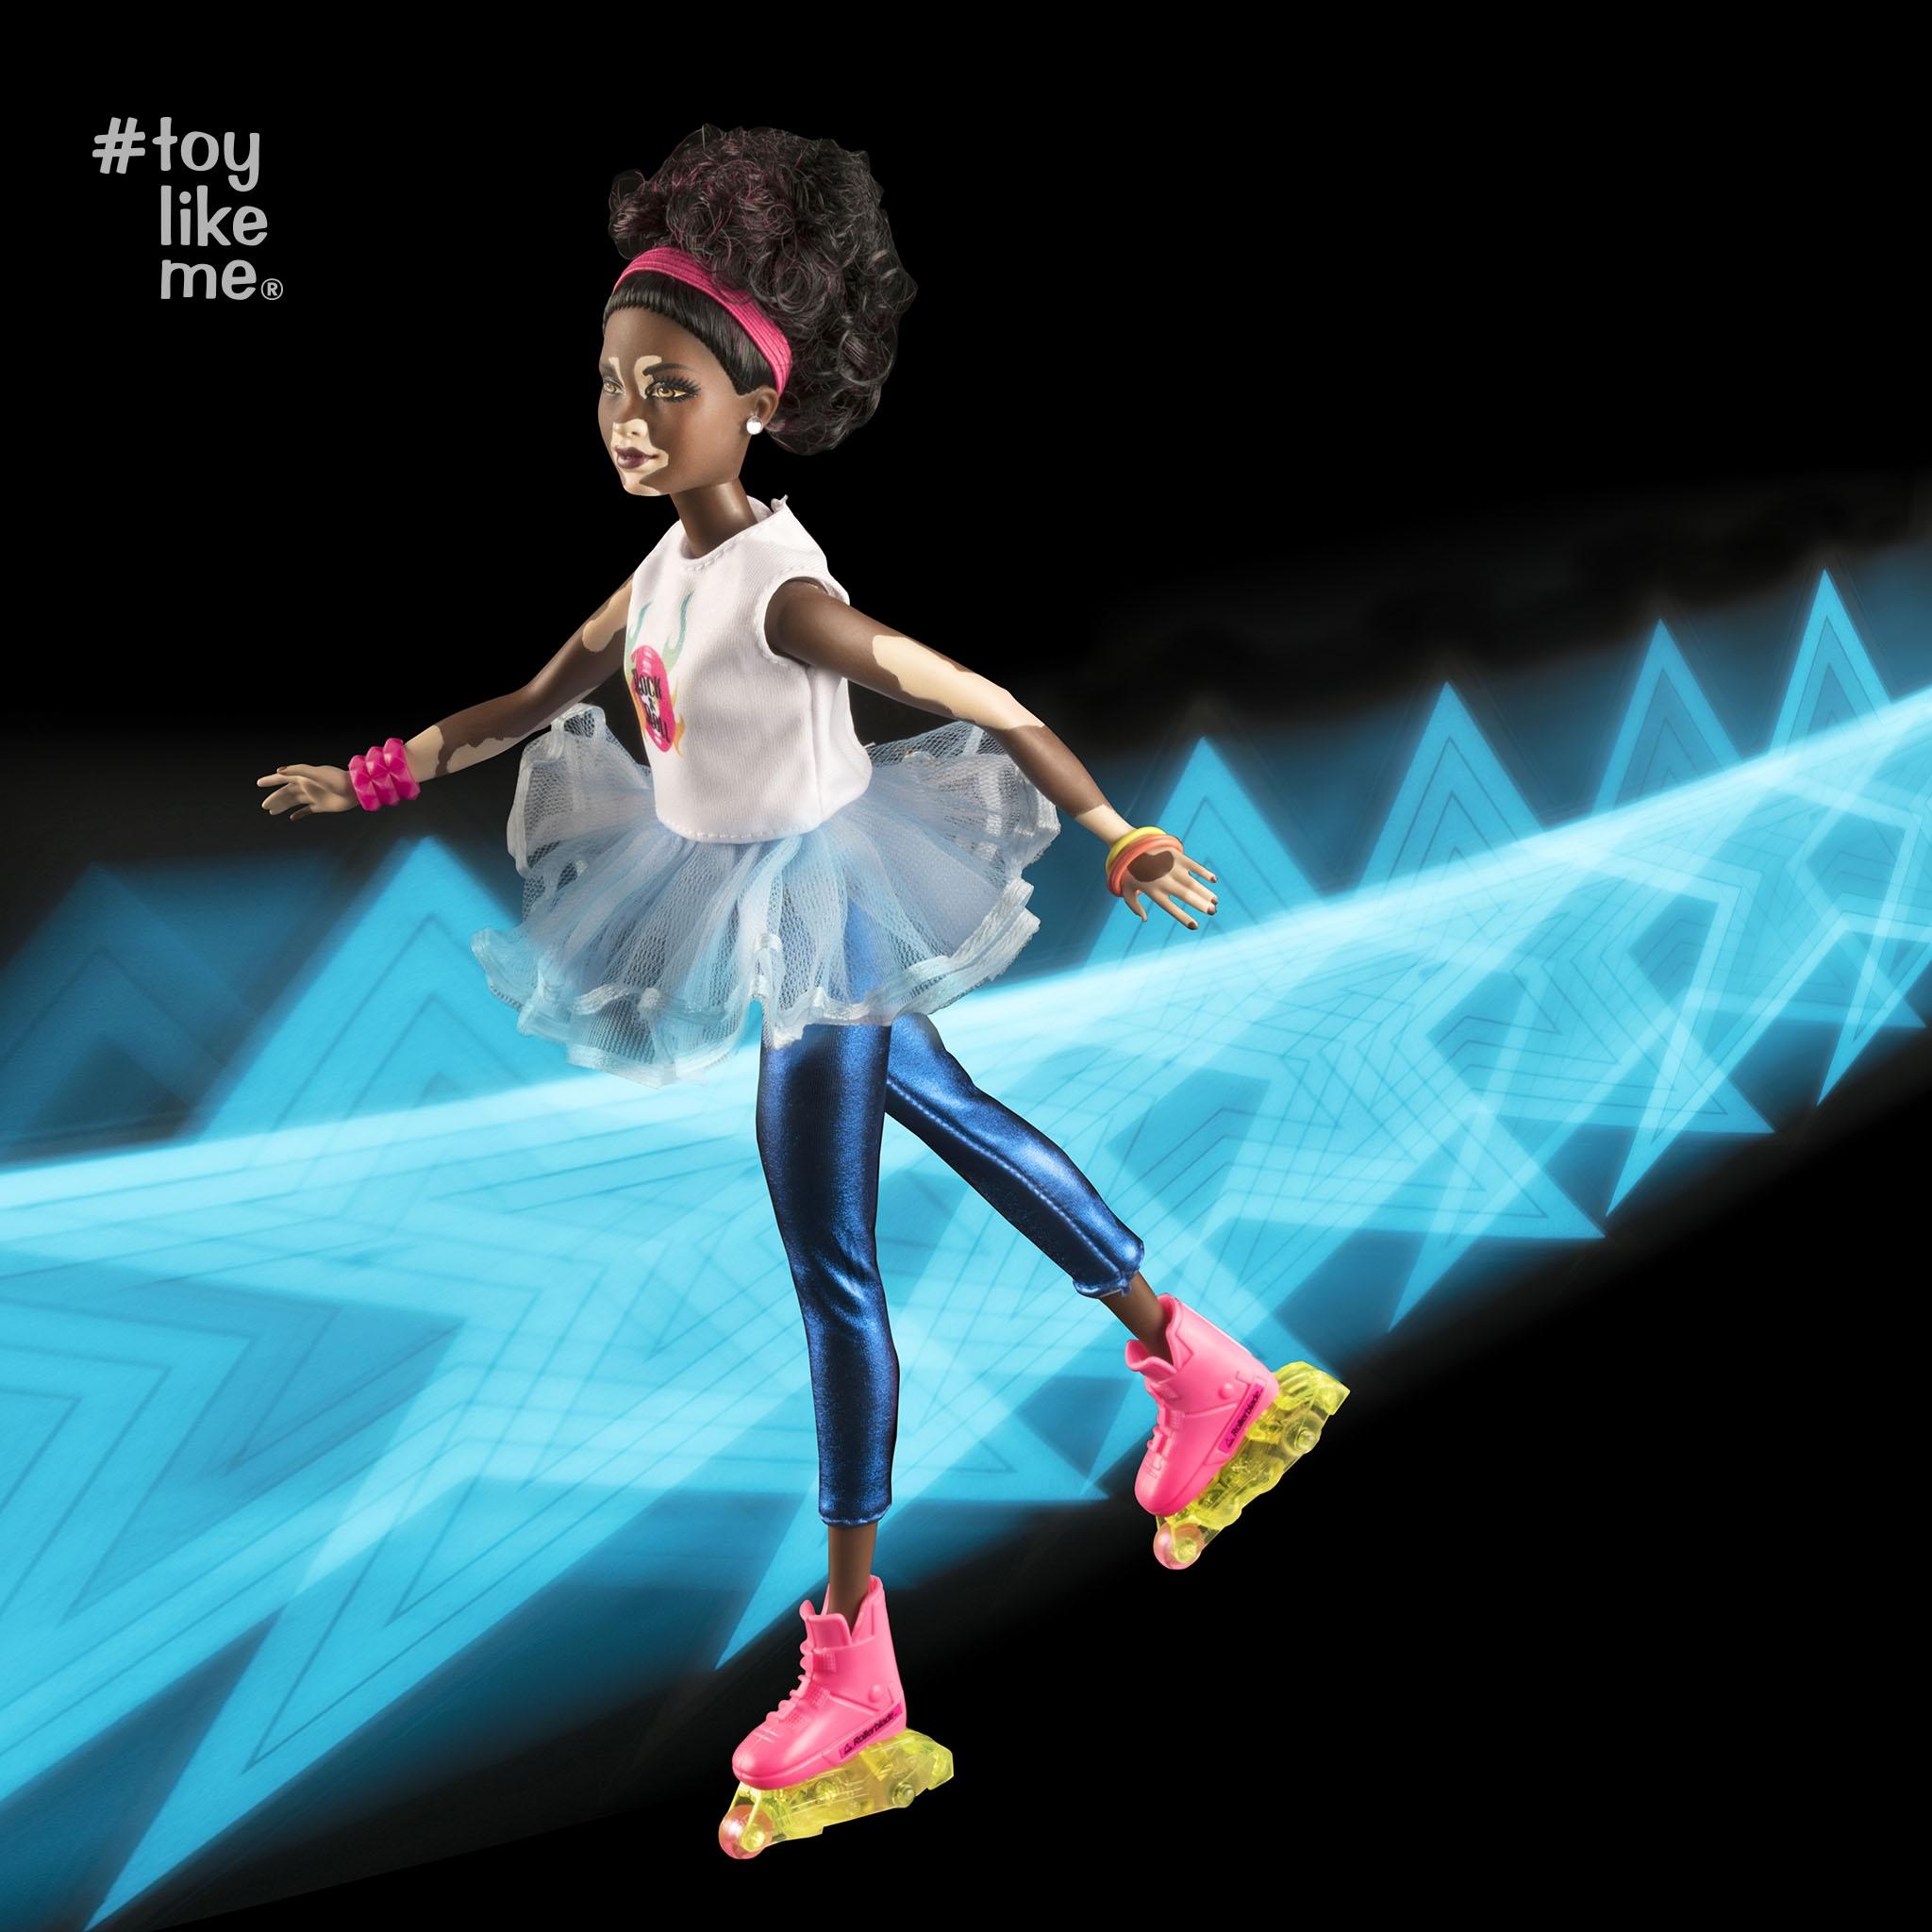 Doll with vitiligo on roller-skates